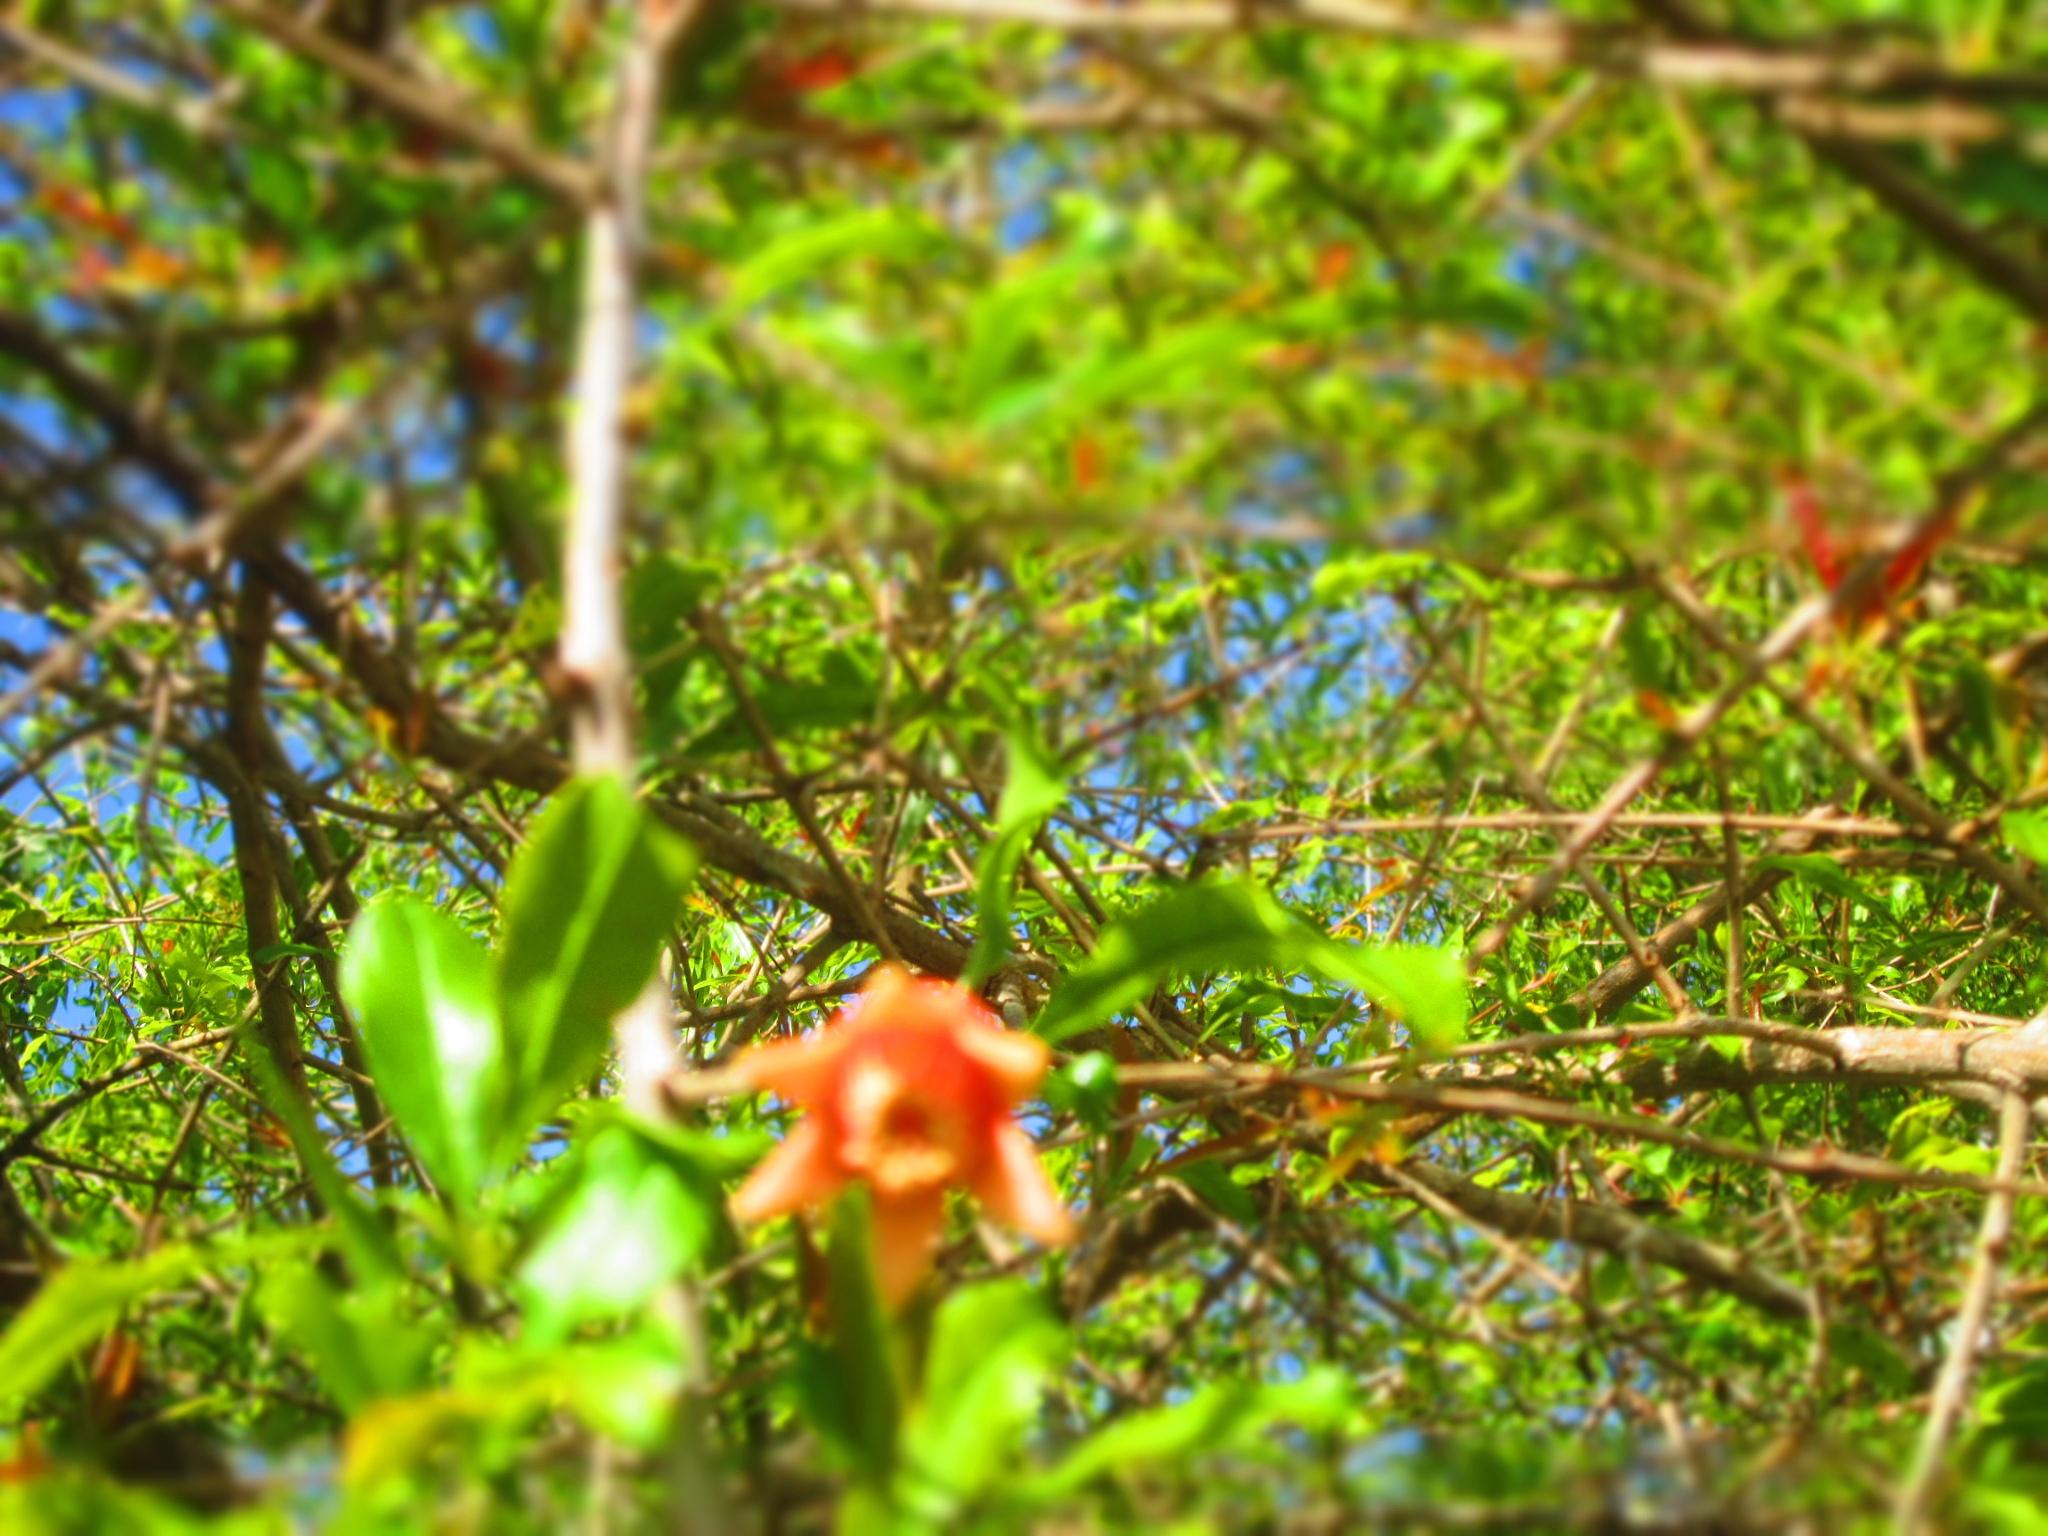 pomegranate blosom  by pamela.kanarr